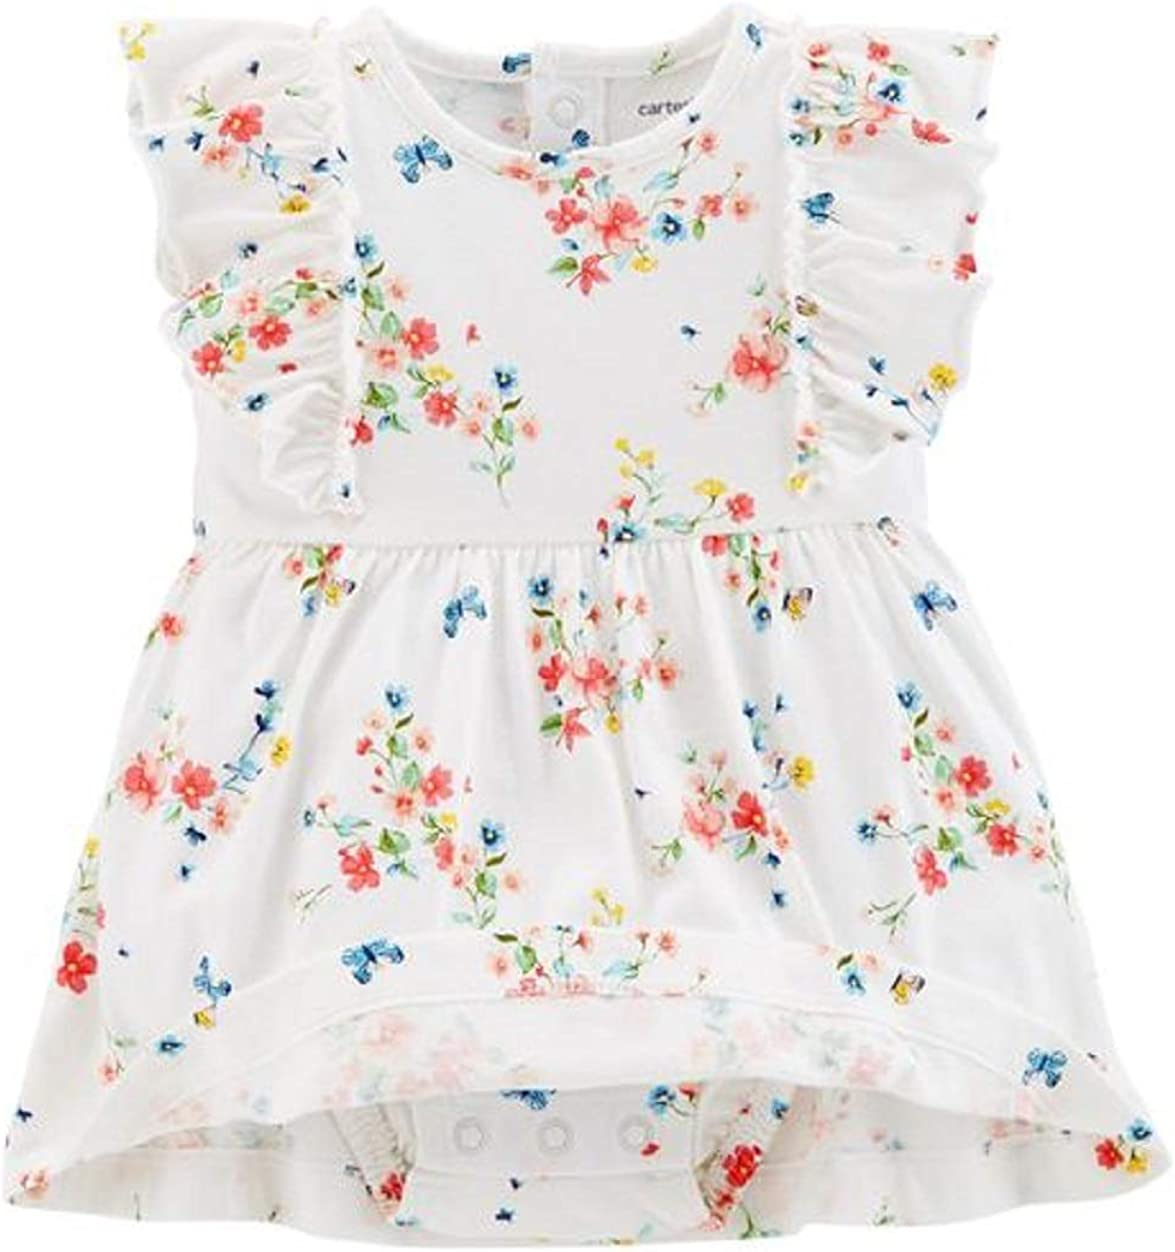 6M Carters Baby Girls Bodysuit Babydoll Waist Dress Flutter Sleeves Plus Matching Cardigan